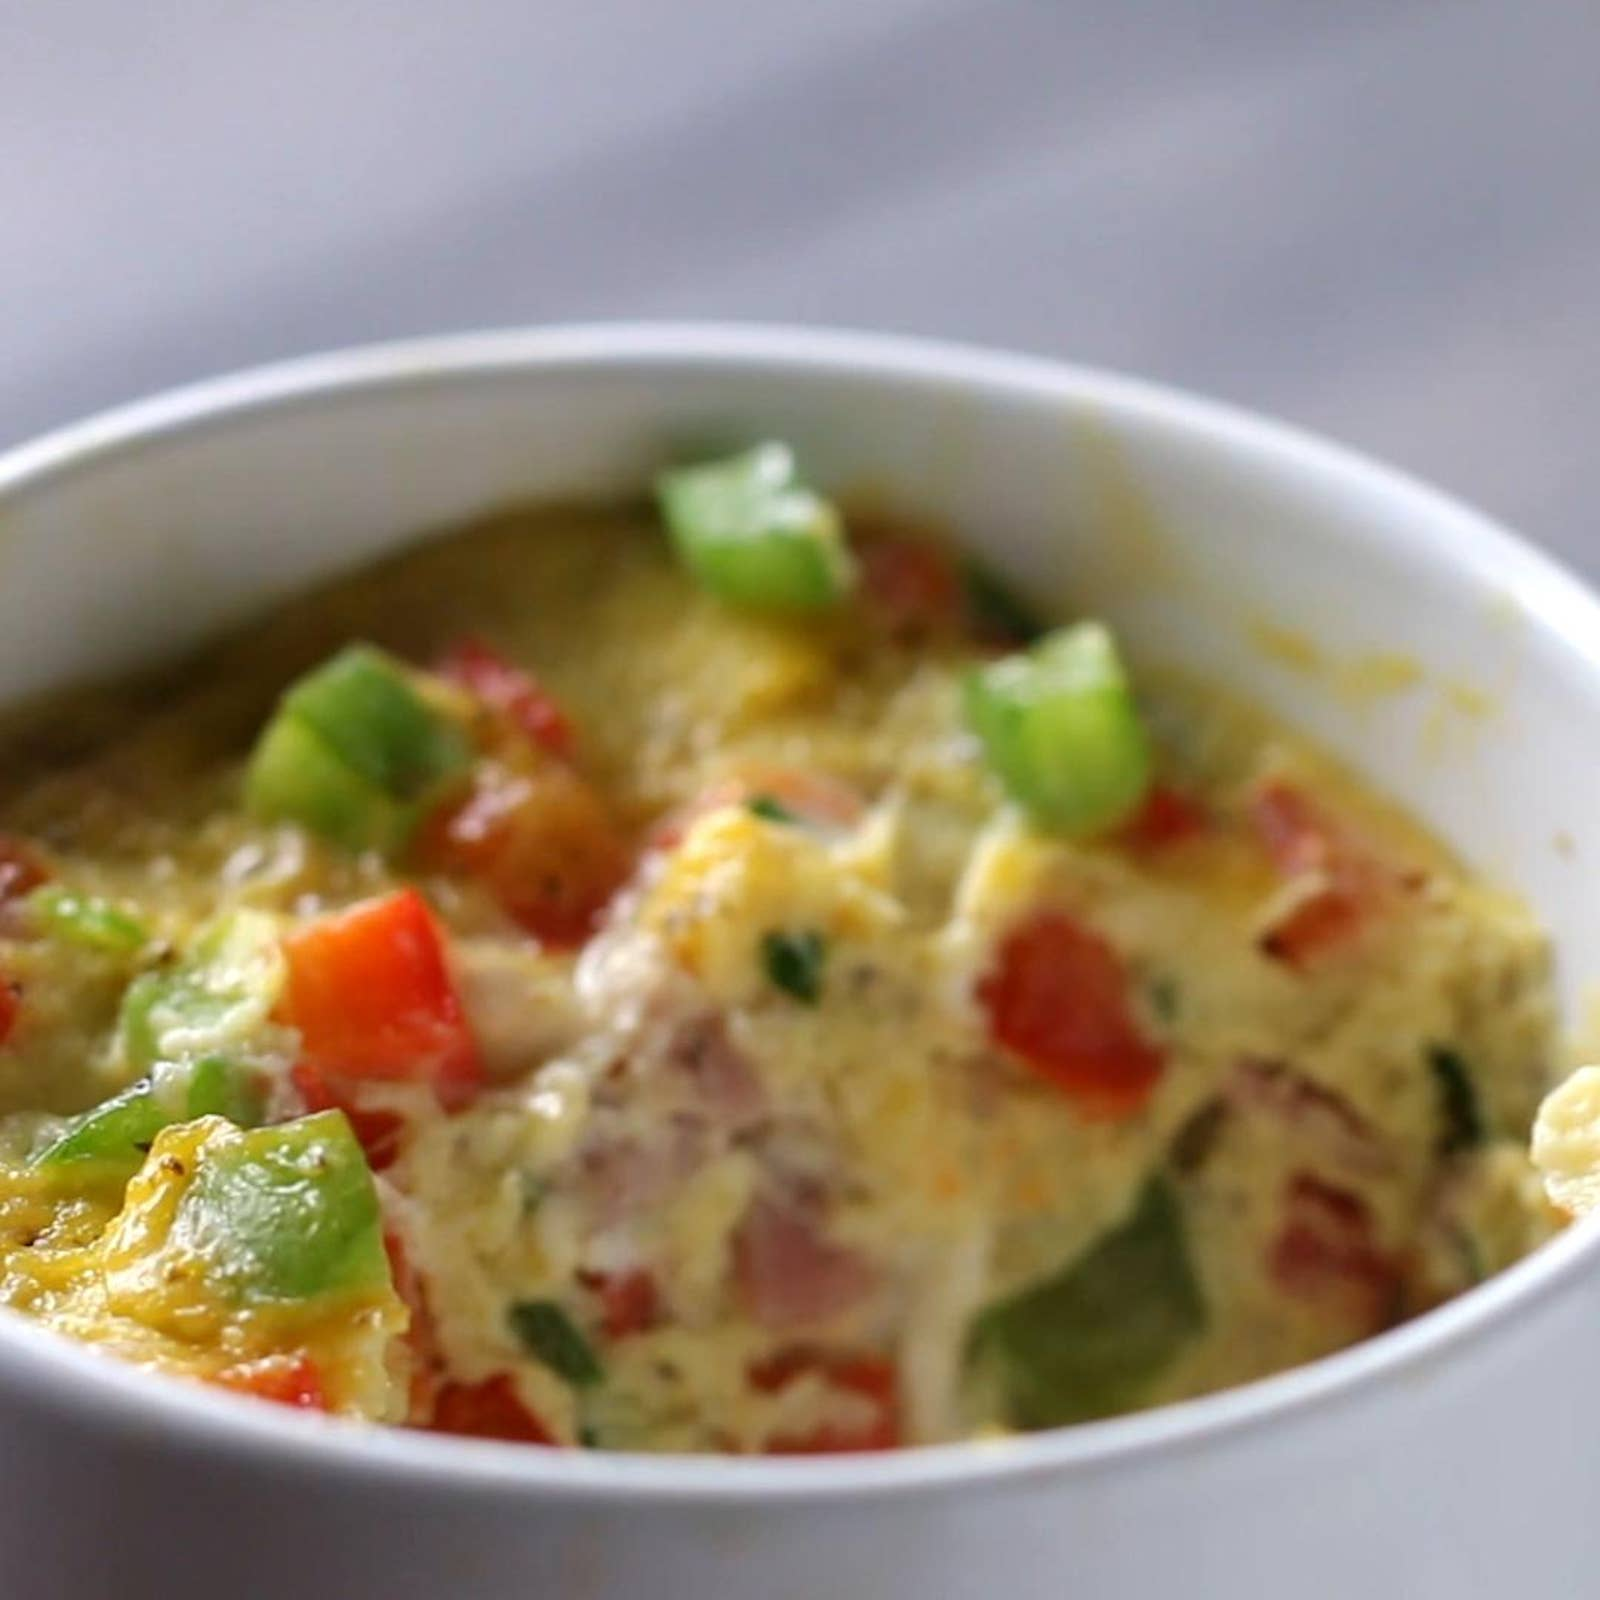 Microwave 3-minute Omelette In A Mug